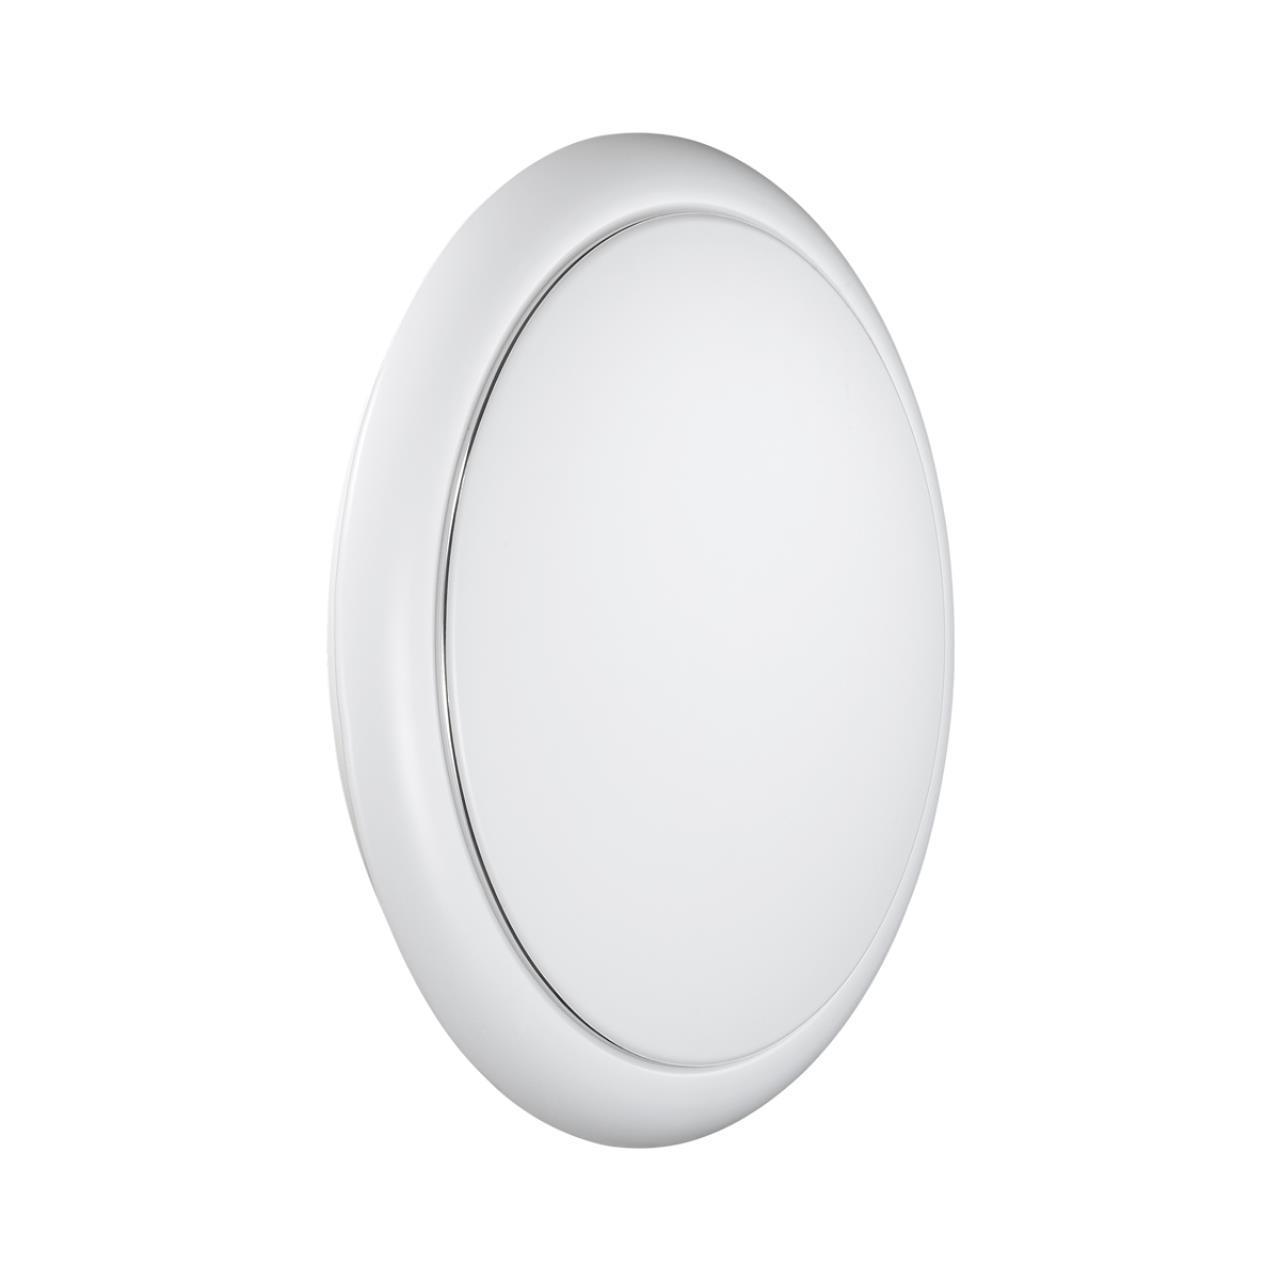 3022/AL VASTA LED SN 036 св-к SMALLI пластик LED 20Вт 4000K D258 IP43